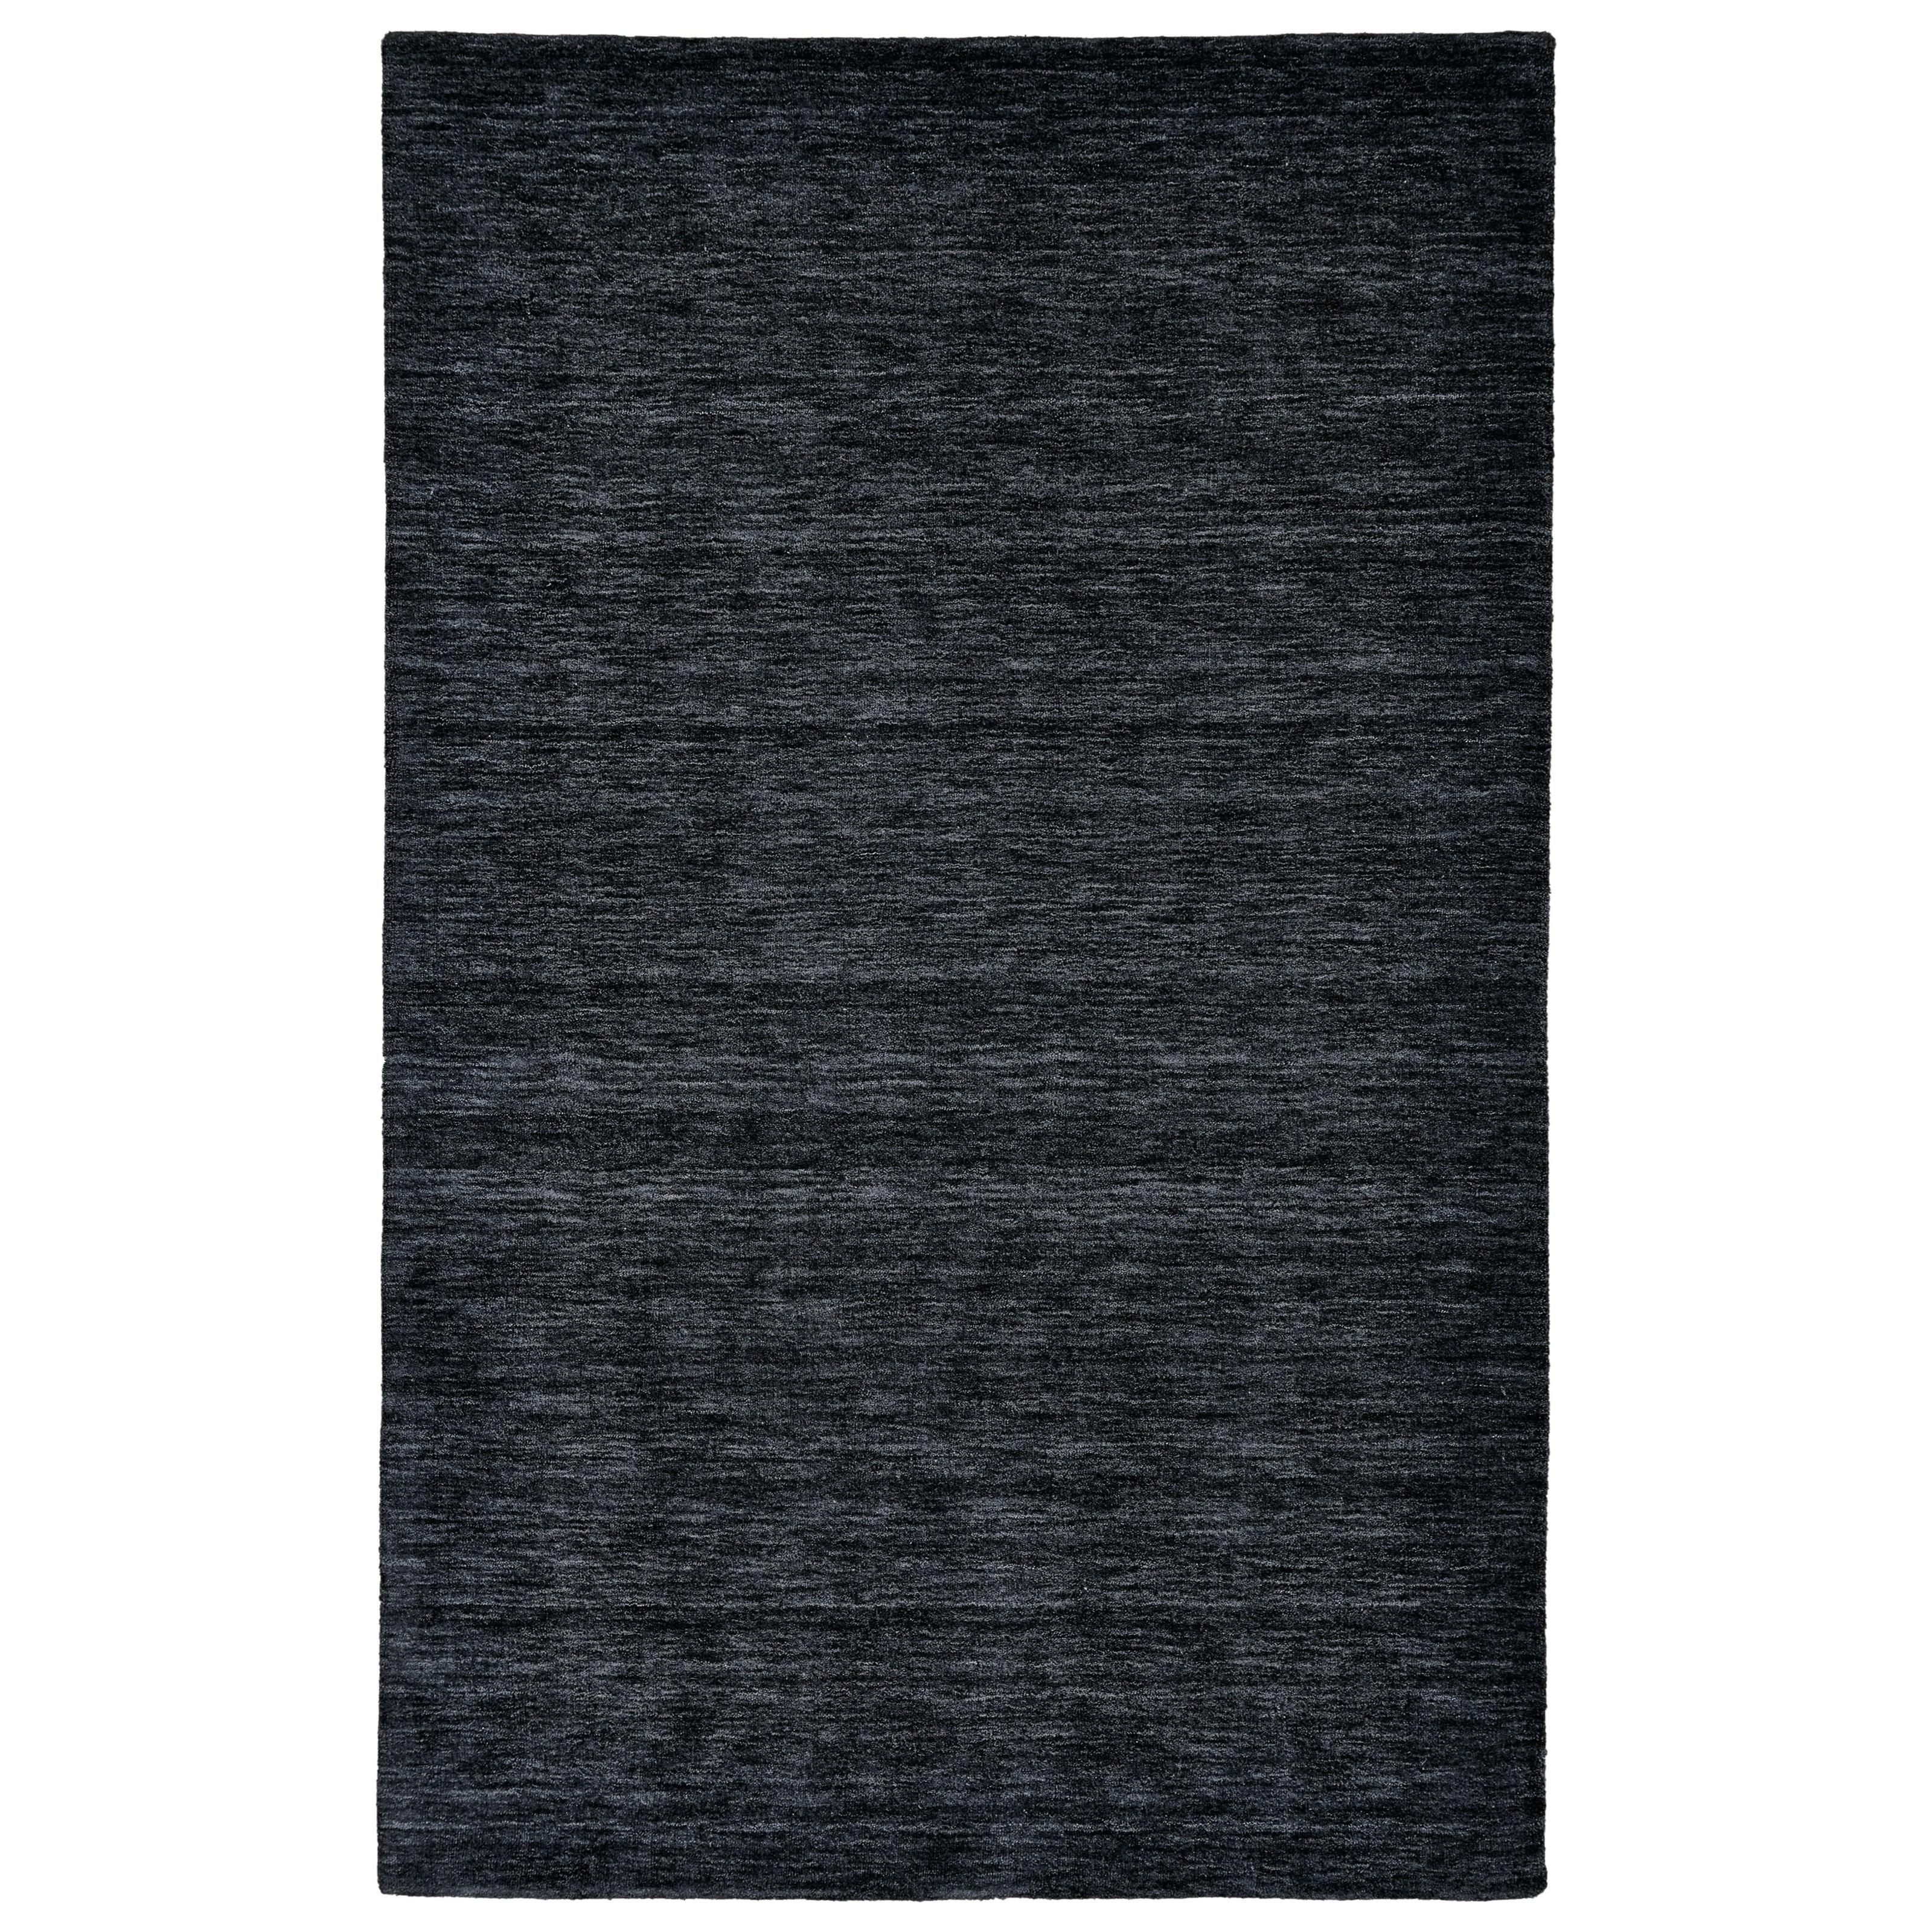 Luna Black 8' X 11' Area Rug by Feizy Rugs at Sprintz Furniture